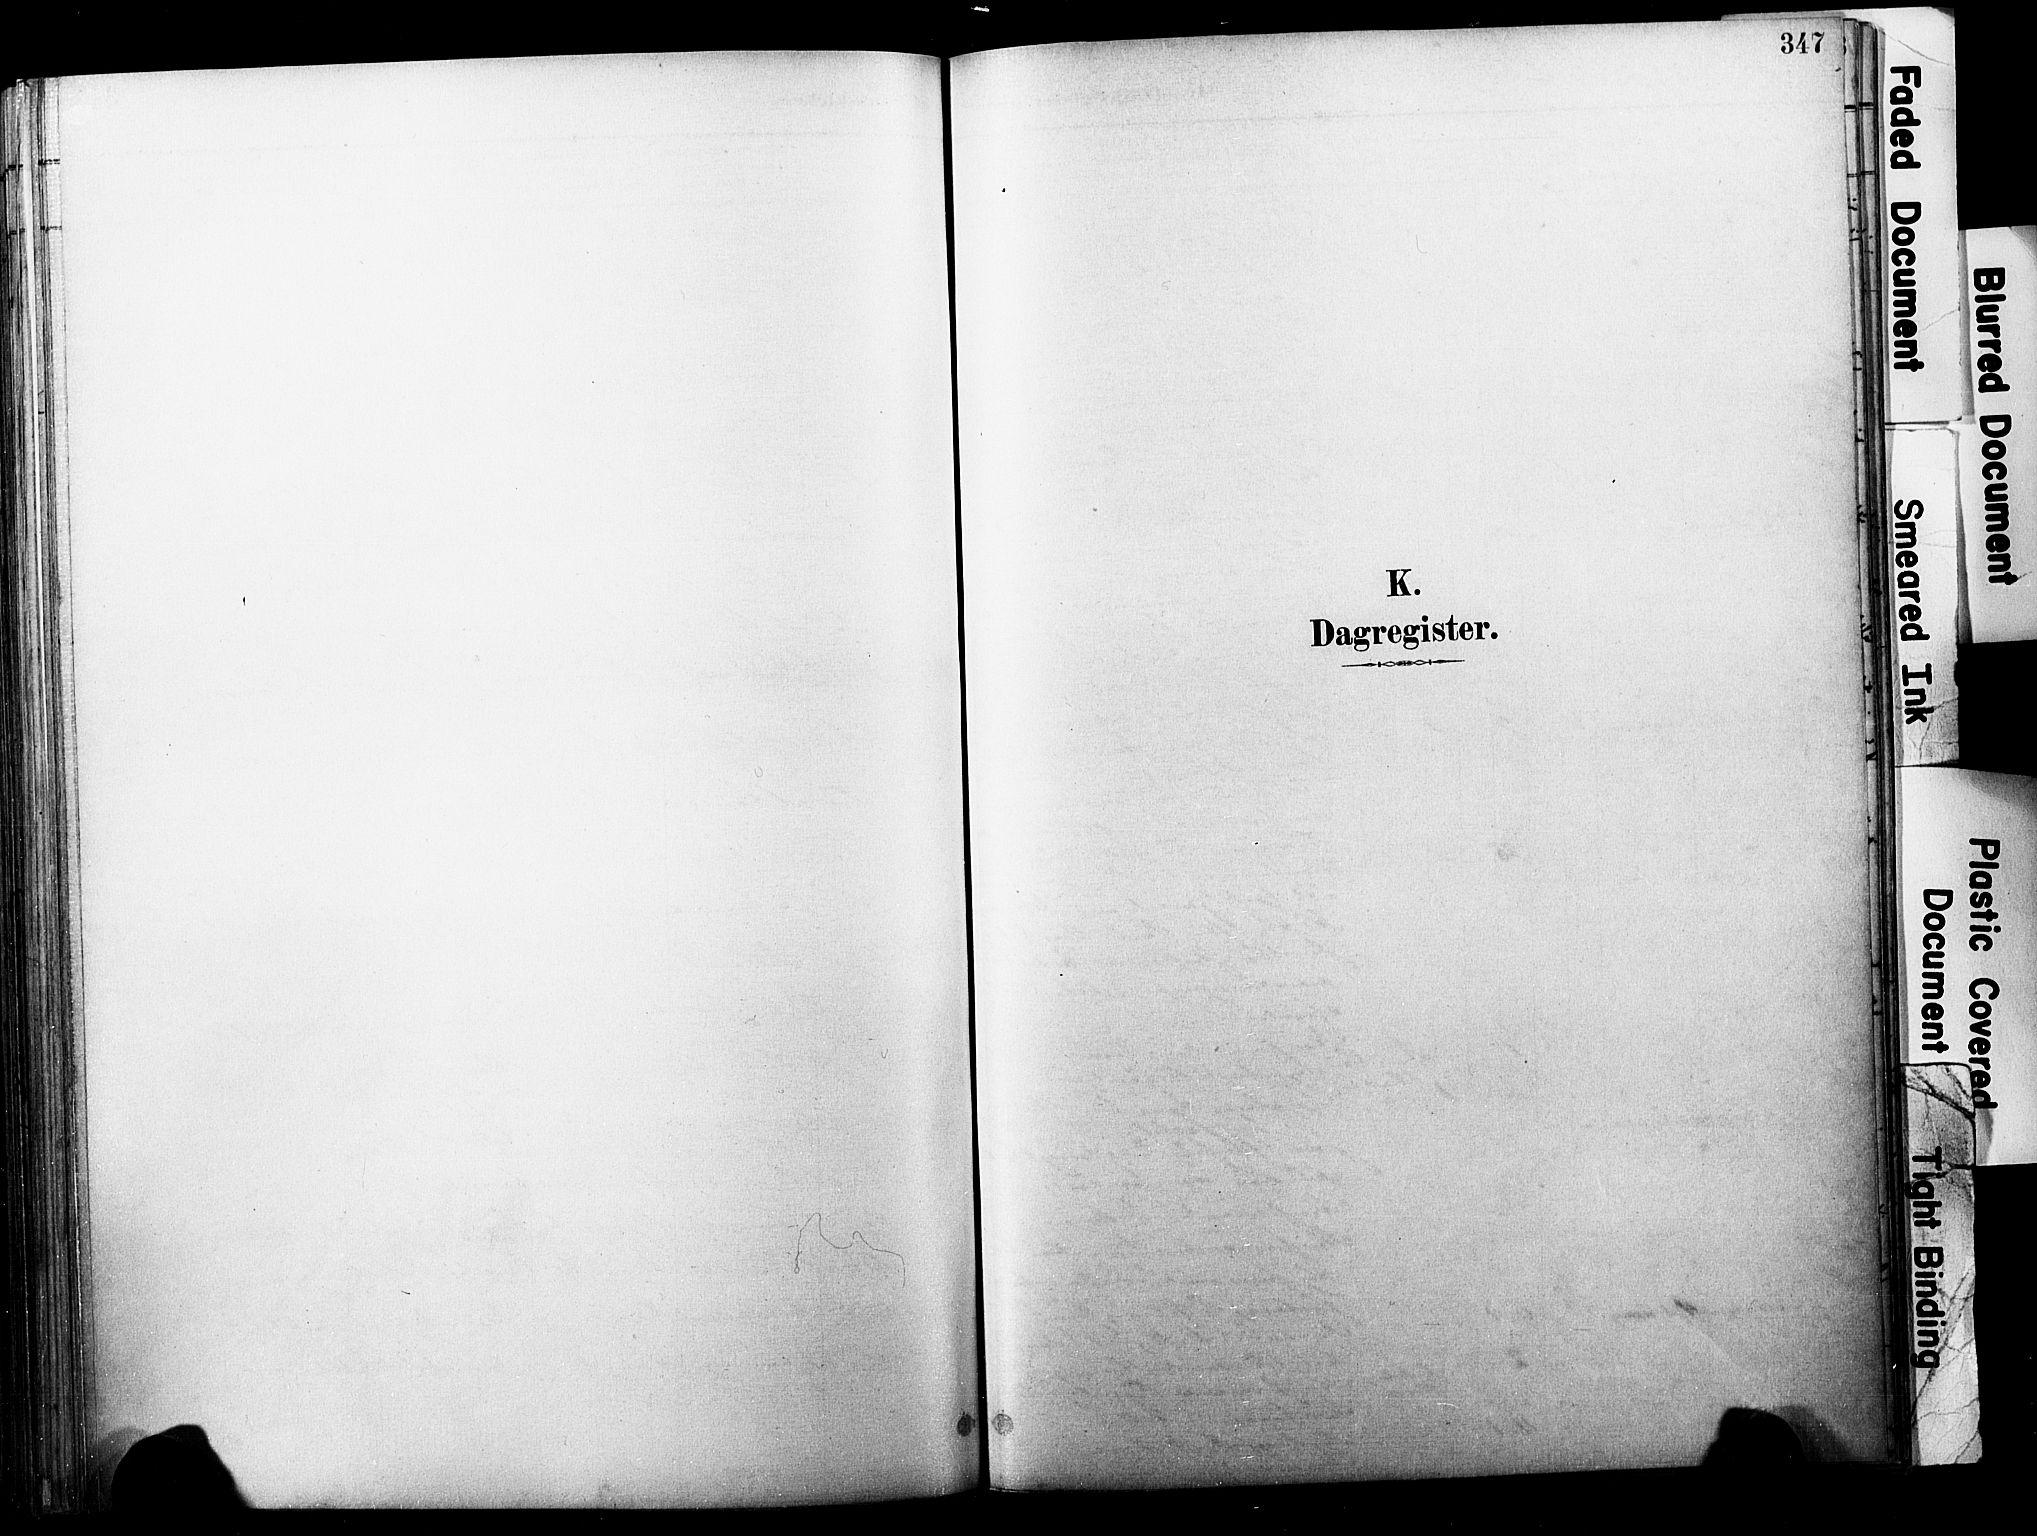 SAKO, Horten kirkebøker, F/Fa/L0004: Parish register (official) no. 4, 1888-1895, p. 347